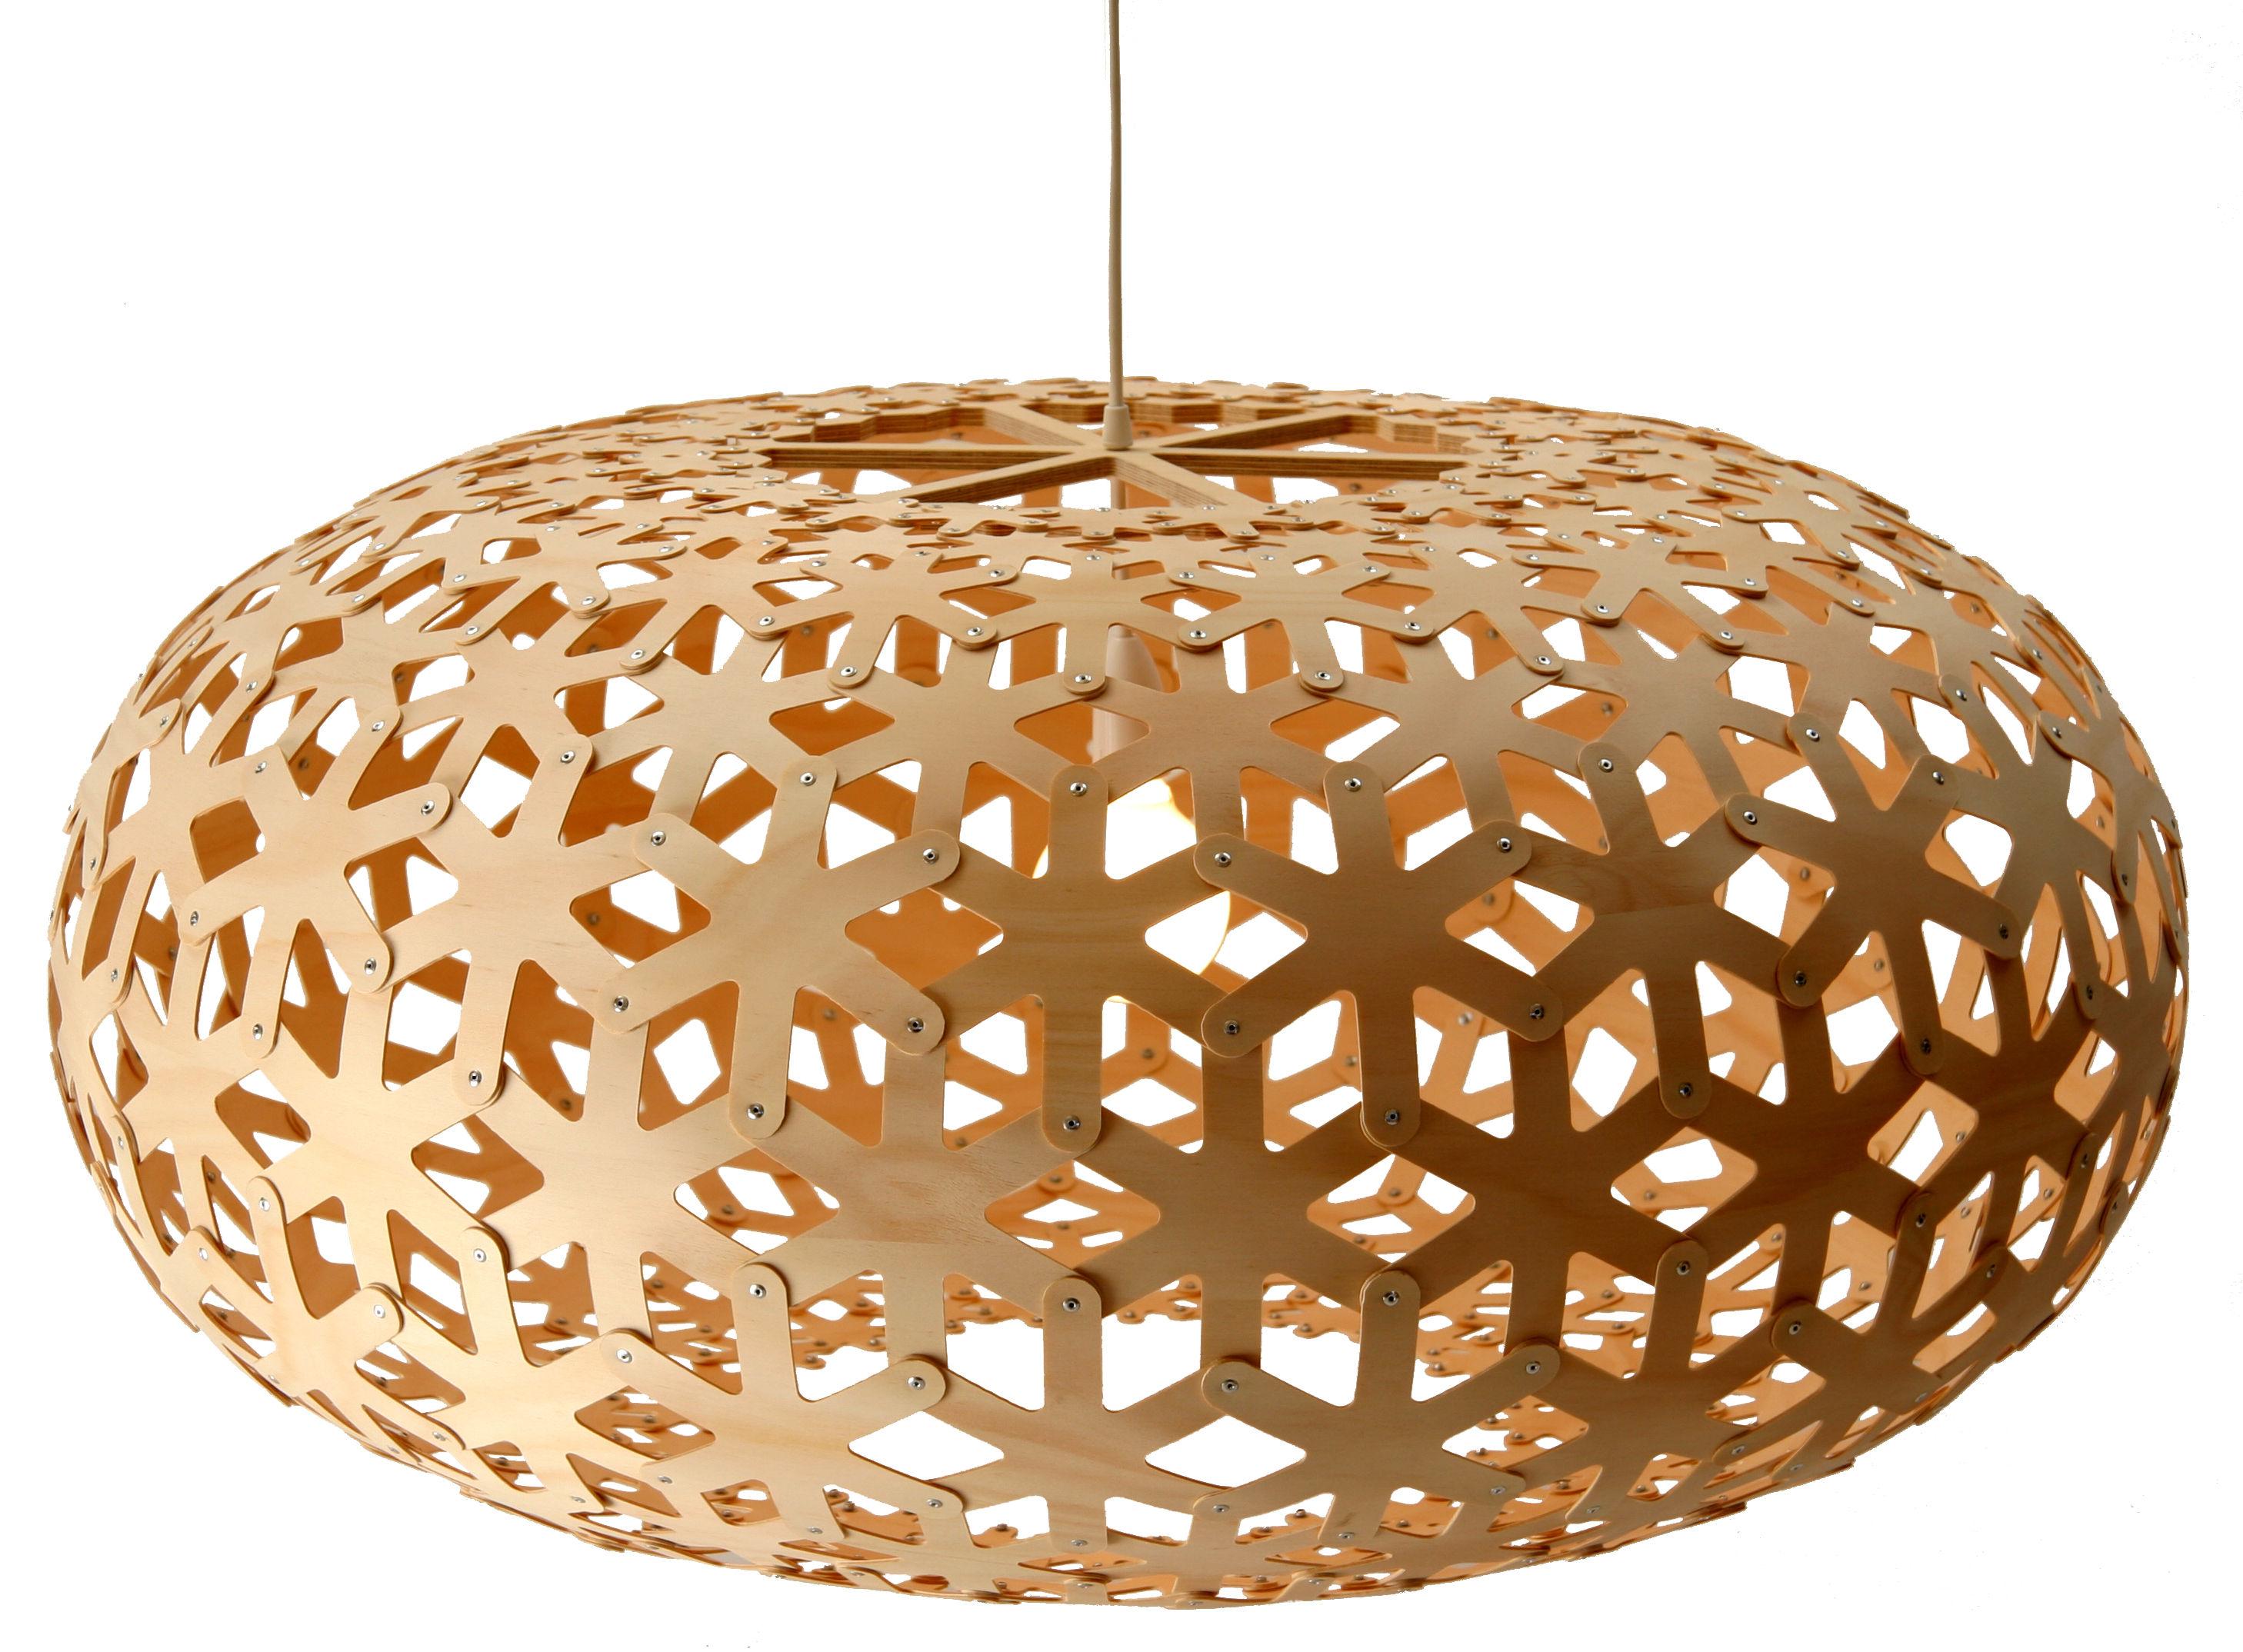 Lighting - Pendant Lighting - Snowflake Pendant by David Trubridge - Natural wood - Pine plywood